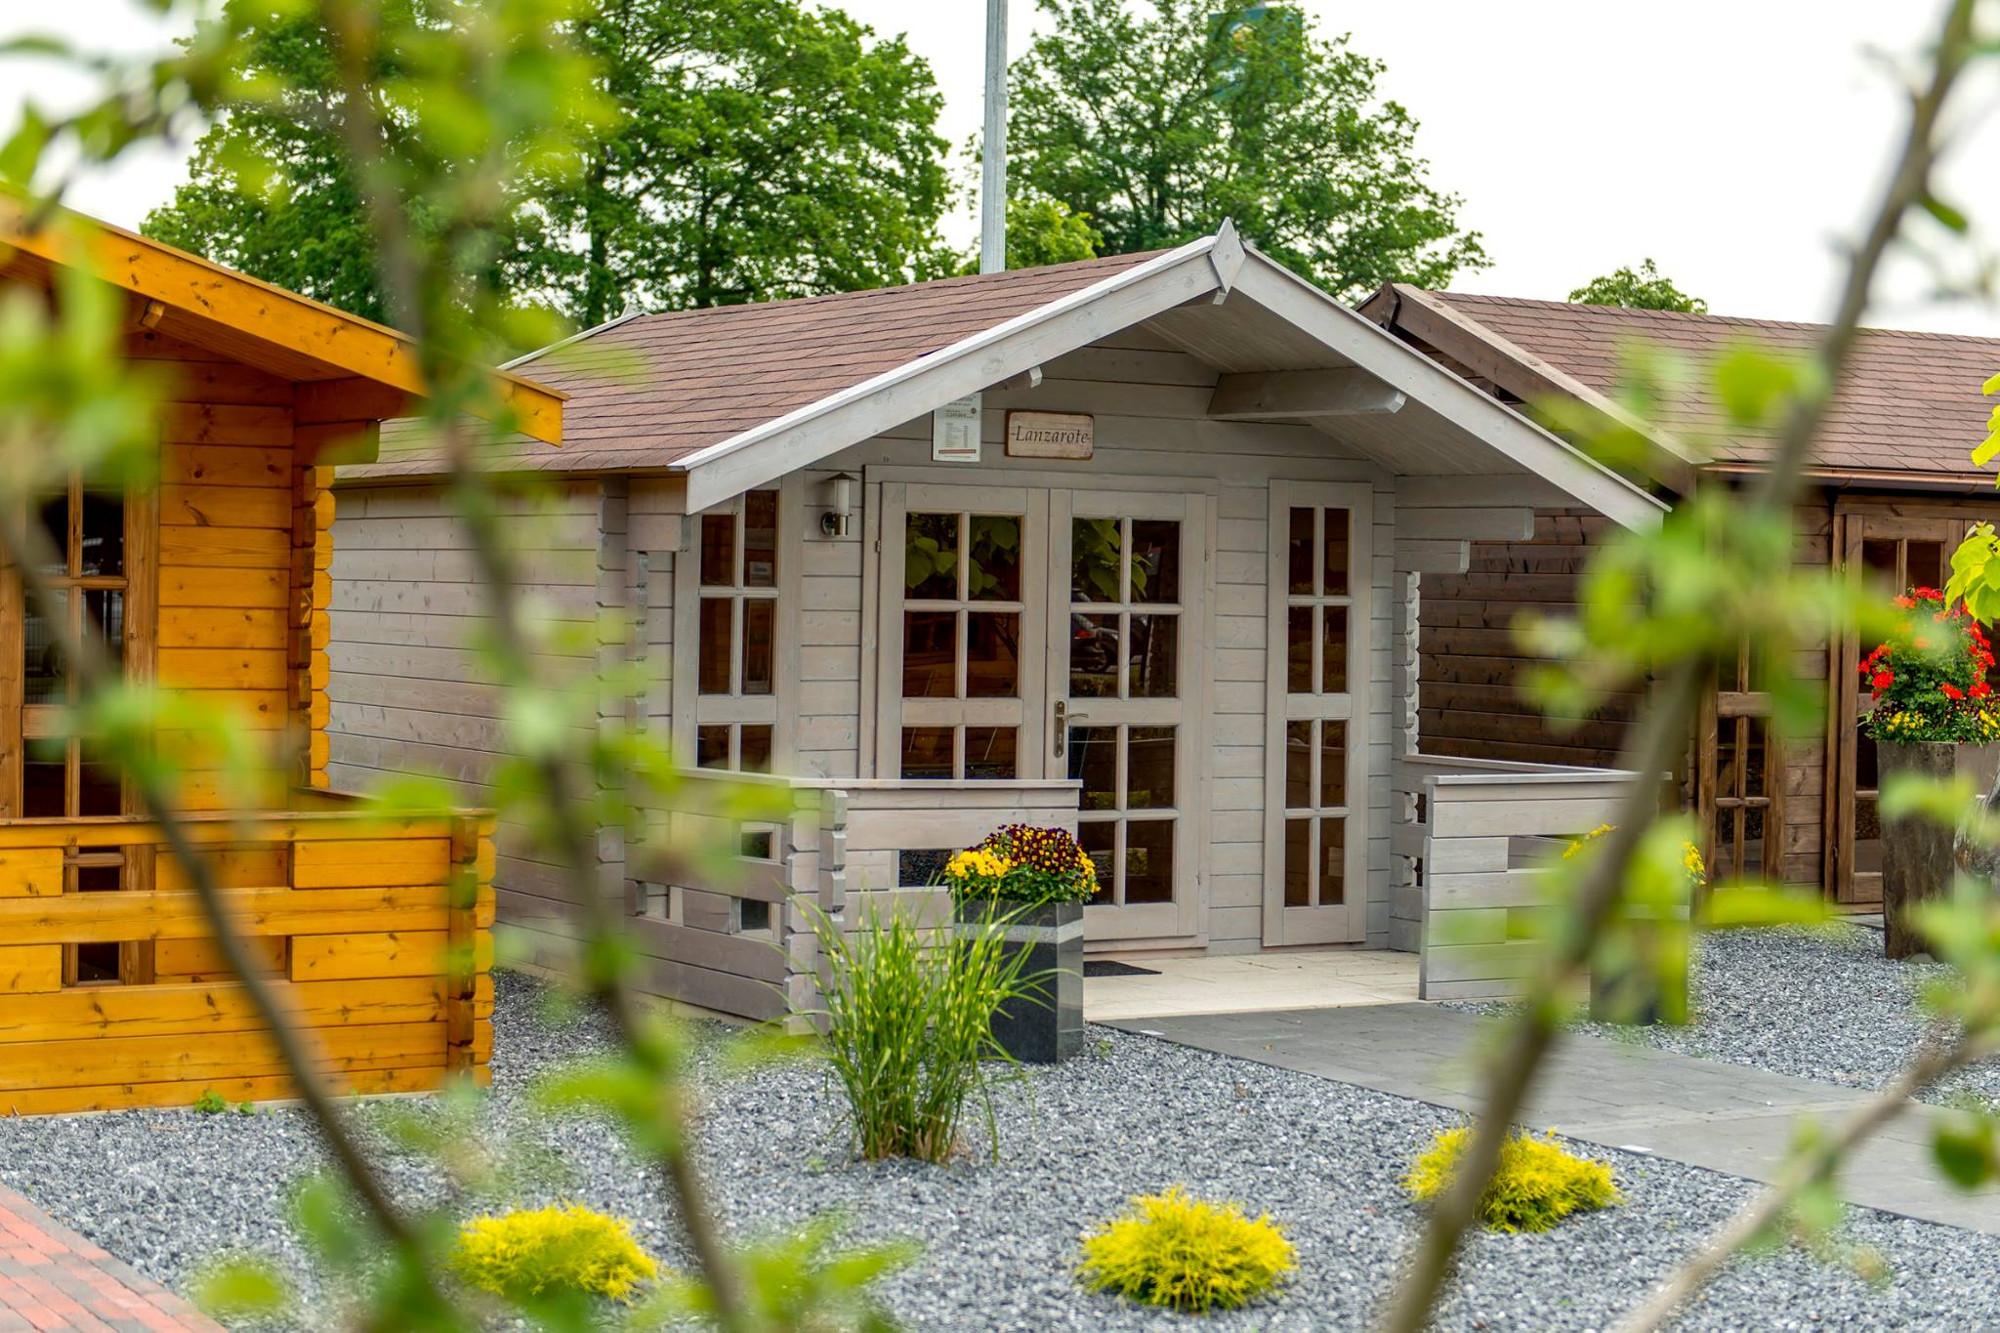 gartenhaus-richtig-platzieren